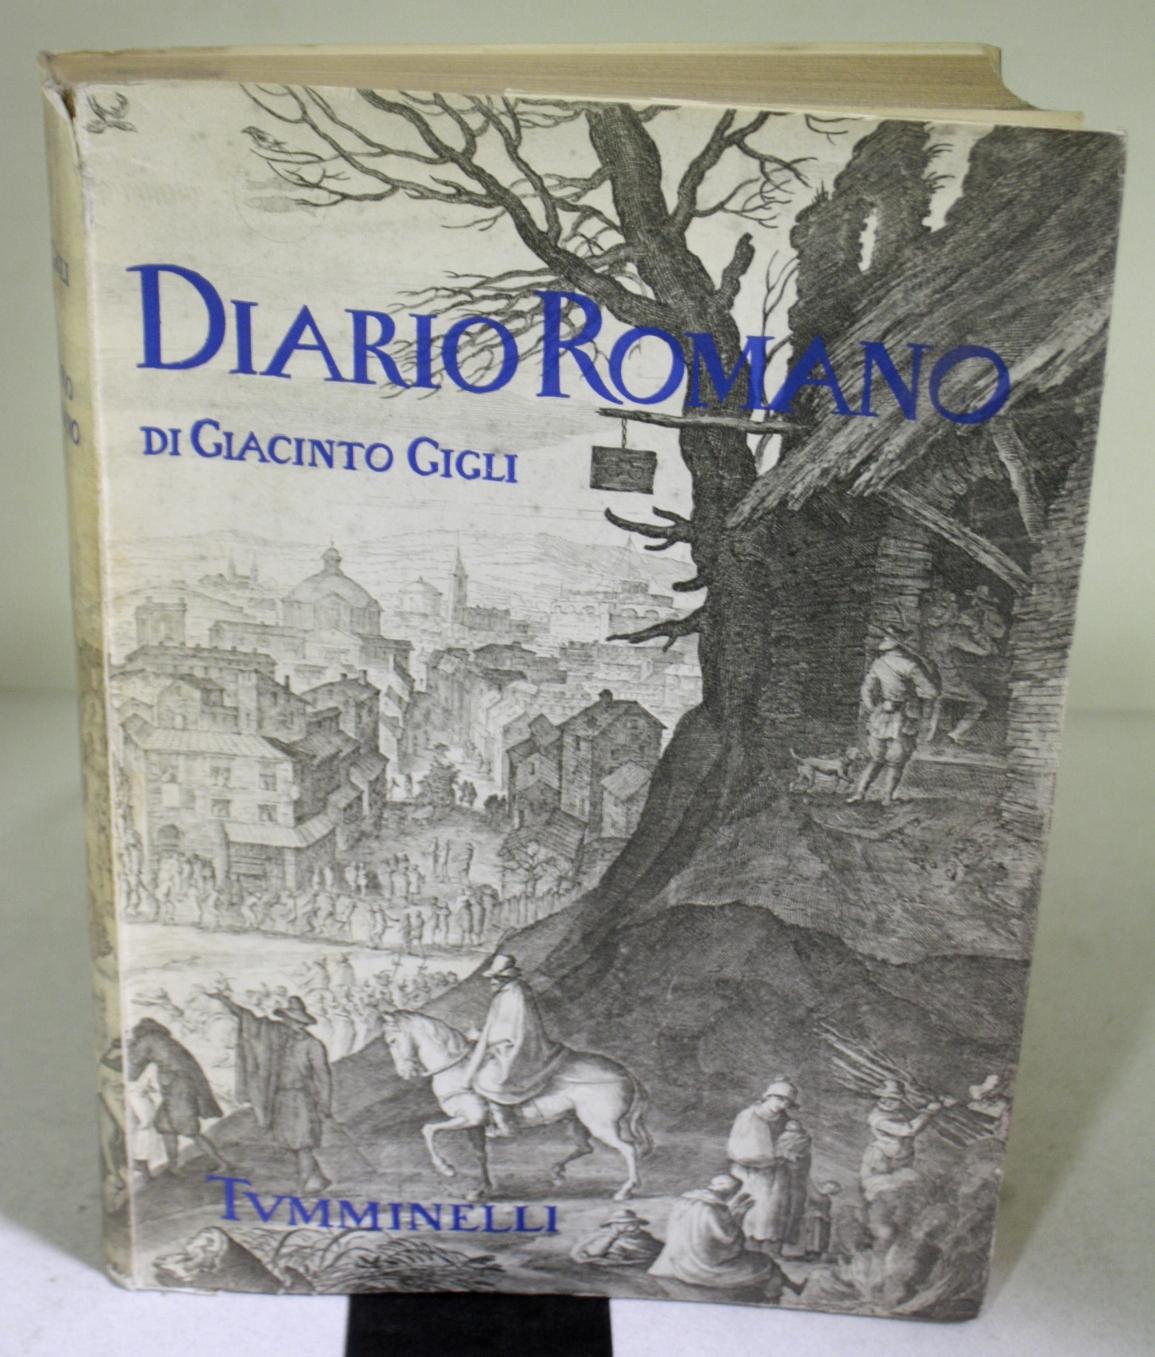 Diario Romano (1608-1670)